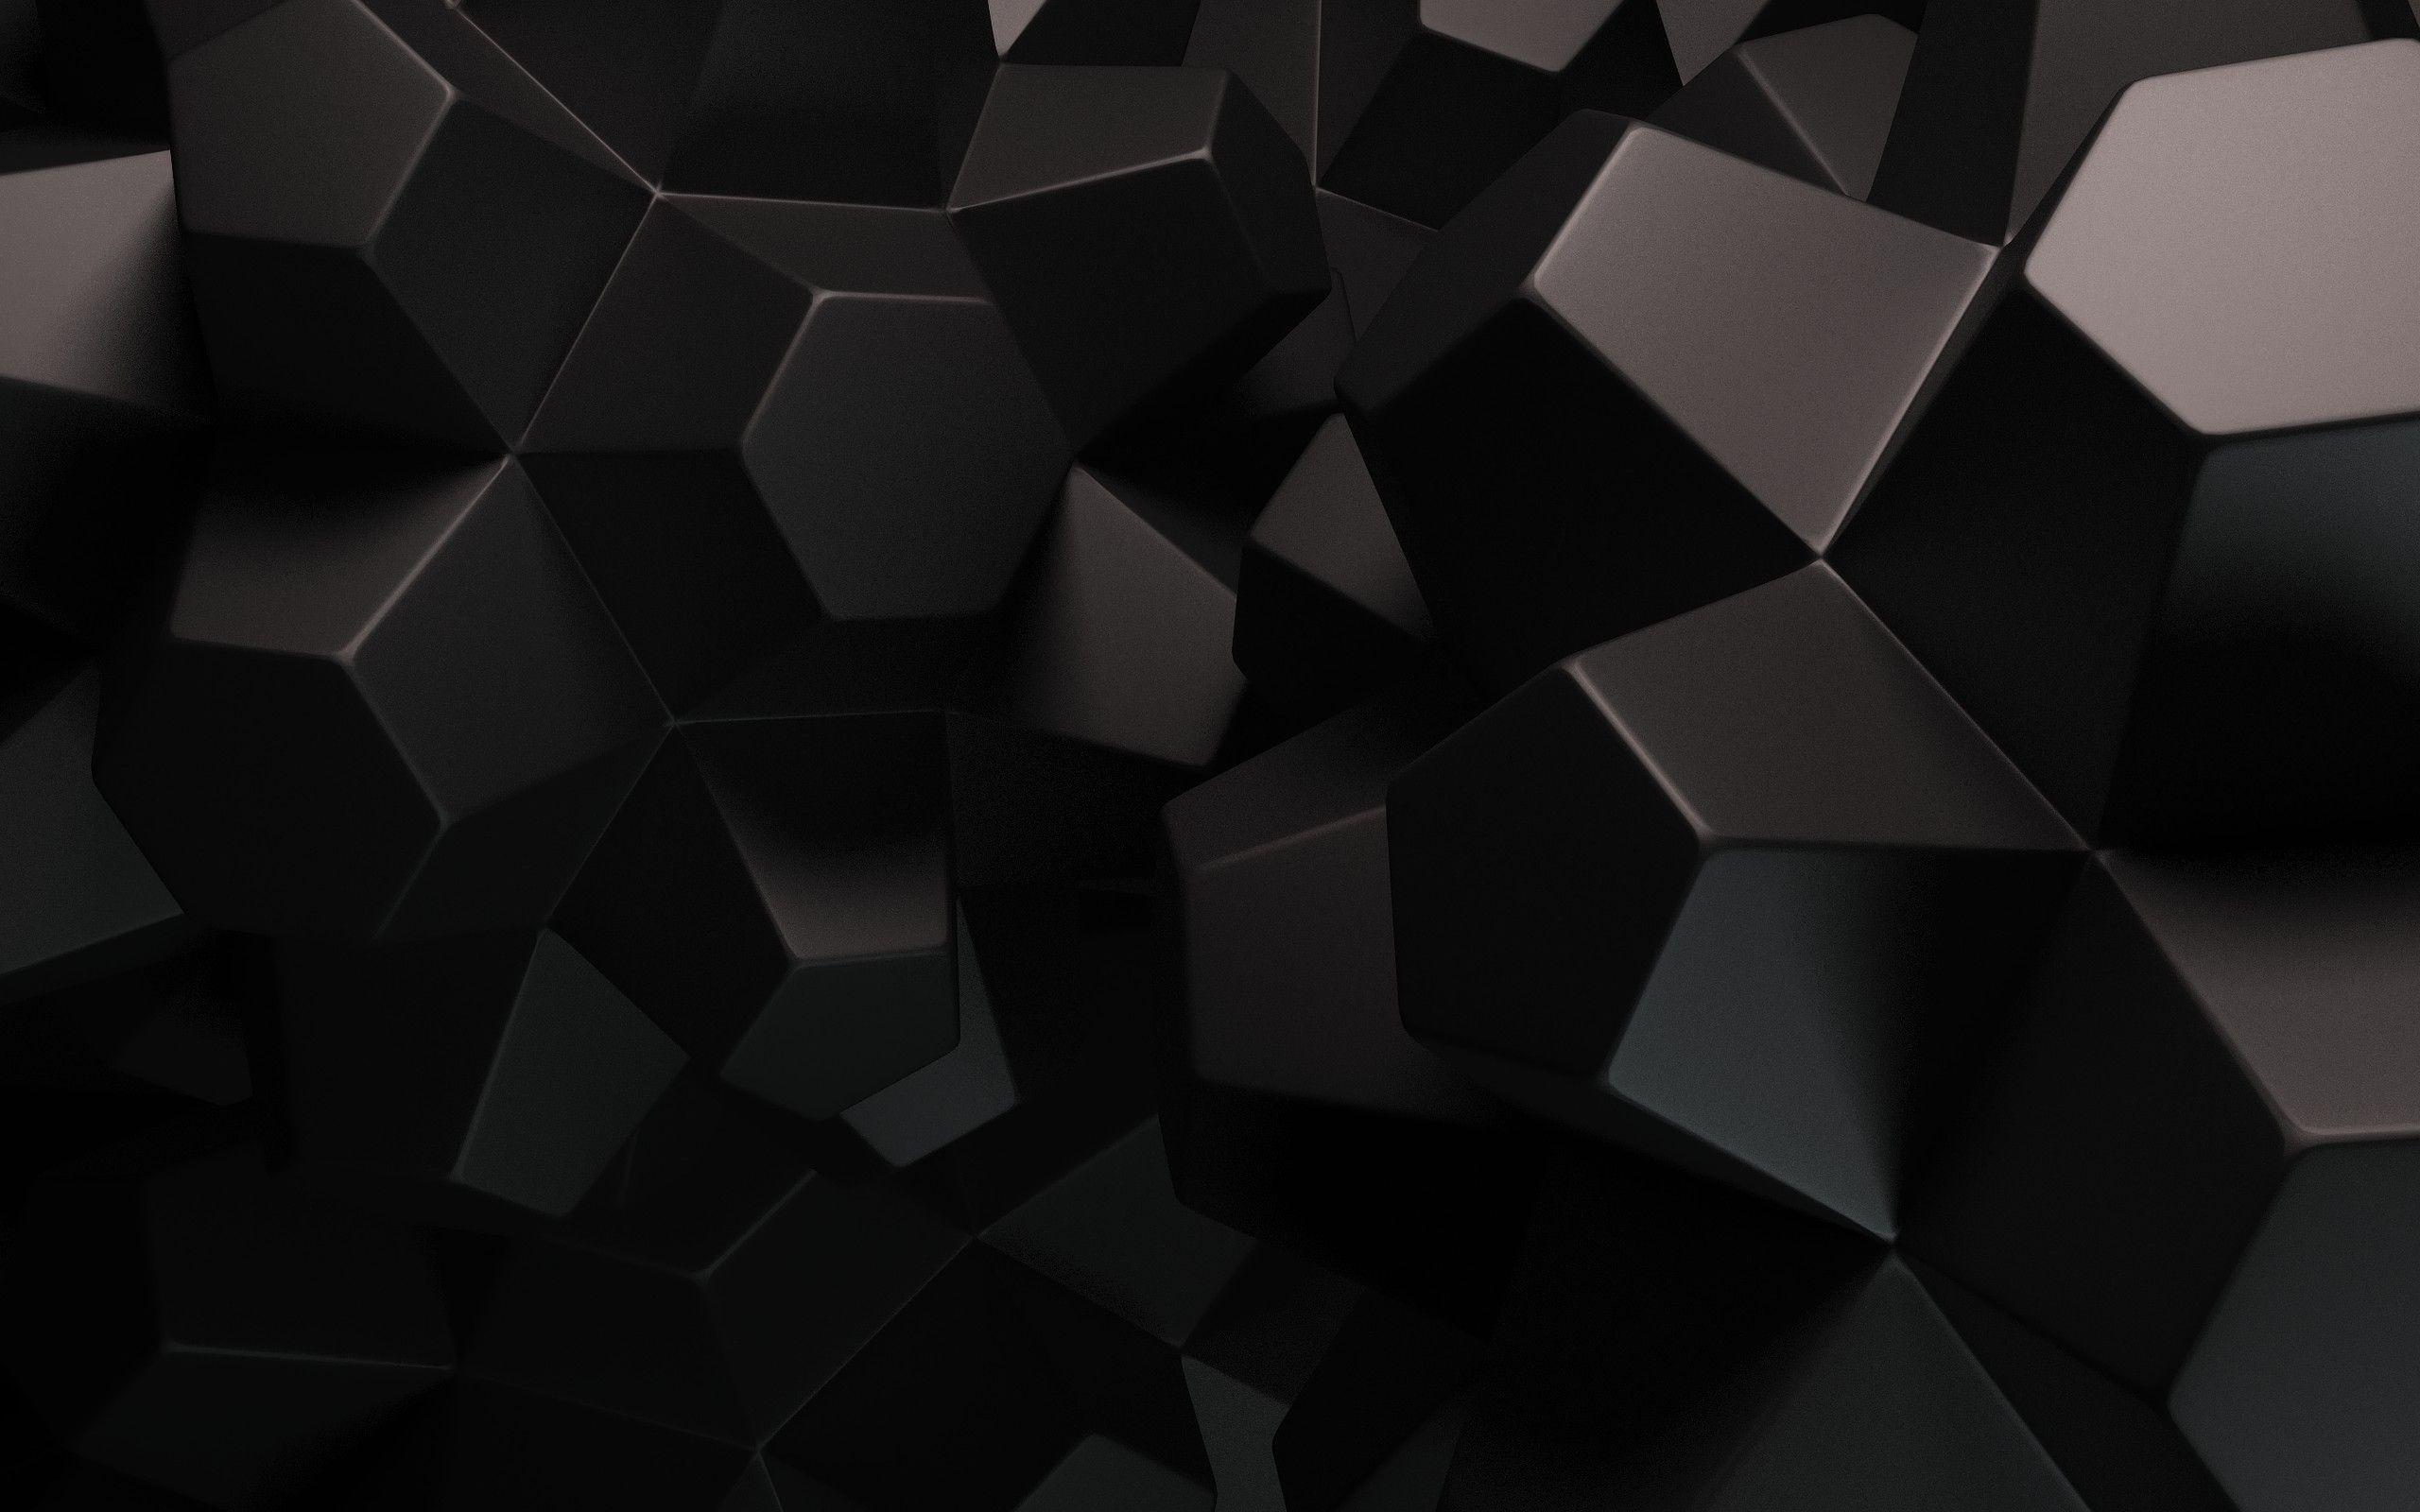 black screen 1080p